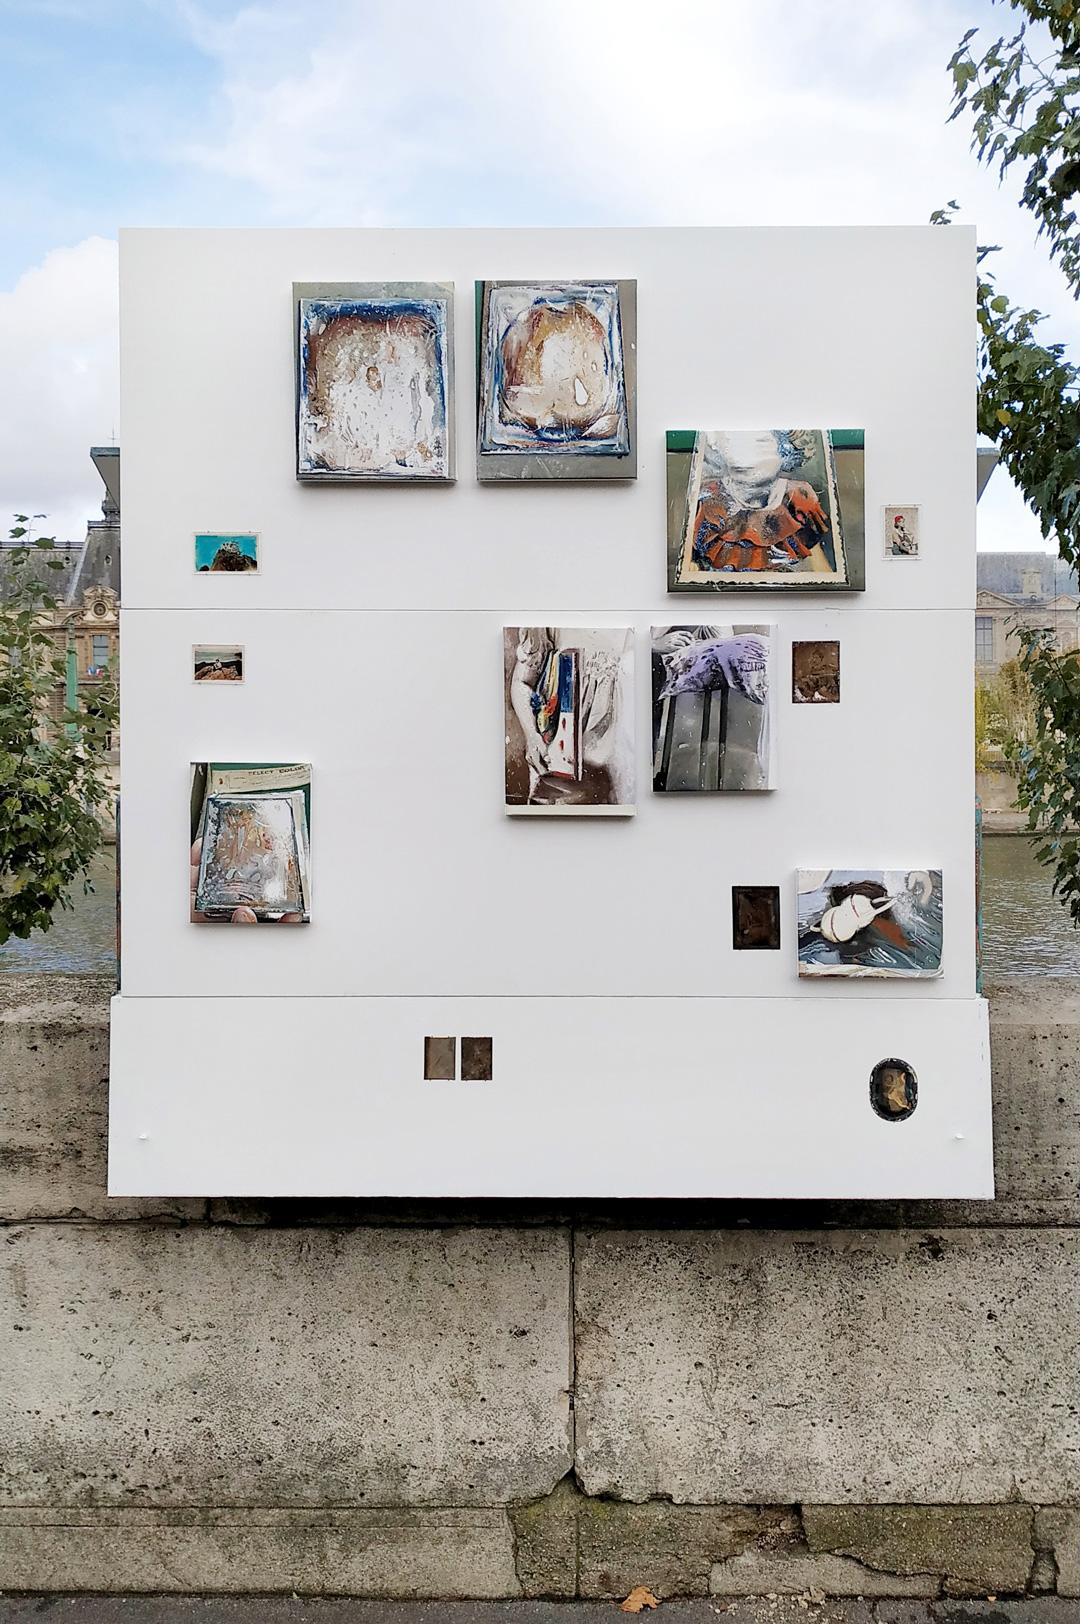 https://mireilleblanc.com/files/gimgs/th-6_Mireille-Blanc-La-déprise-Photo-Saint-Germain-1_v2.jpg